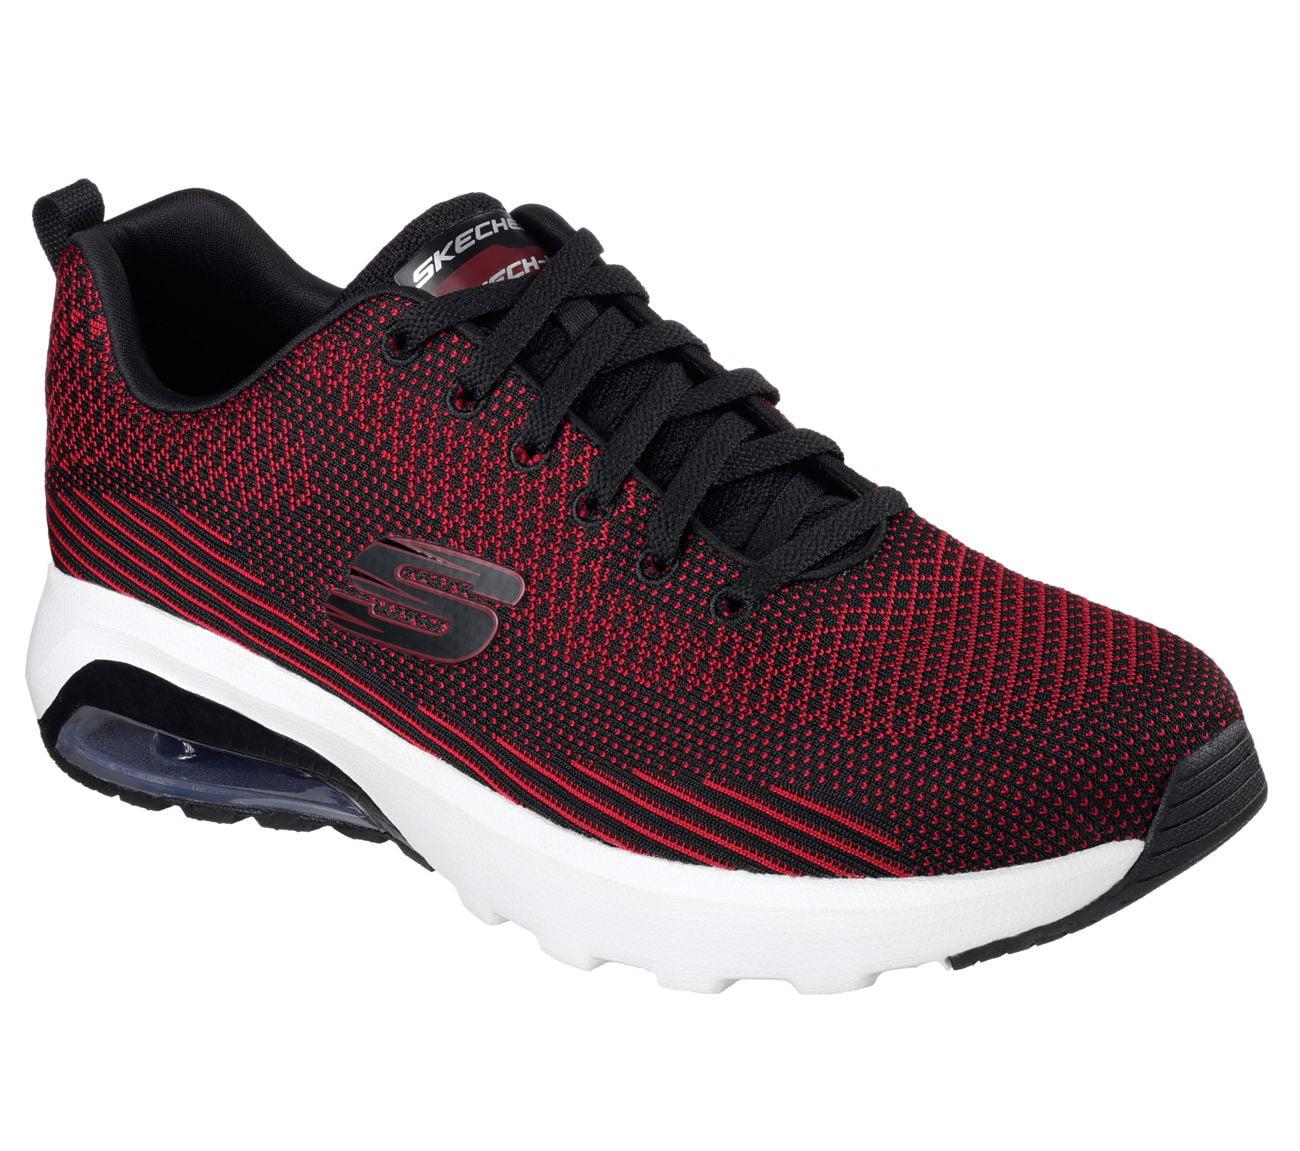 Skechers 51490 BKRD Men's SKECH-AIR VARSITY Sneaker by Skechers